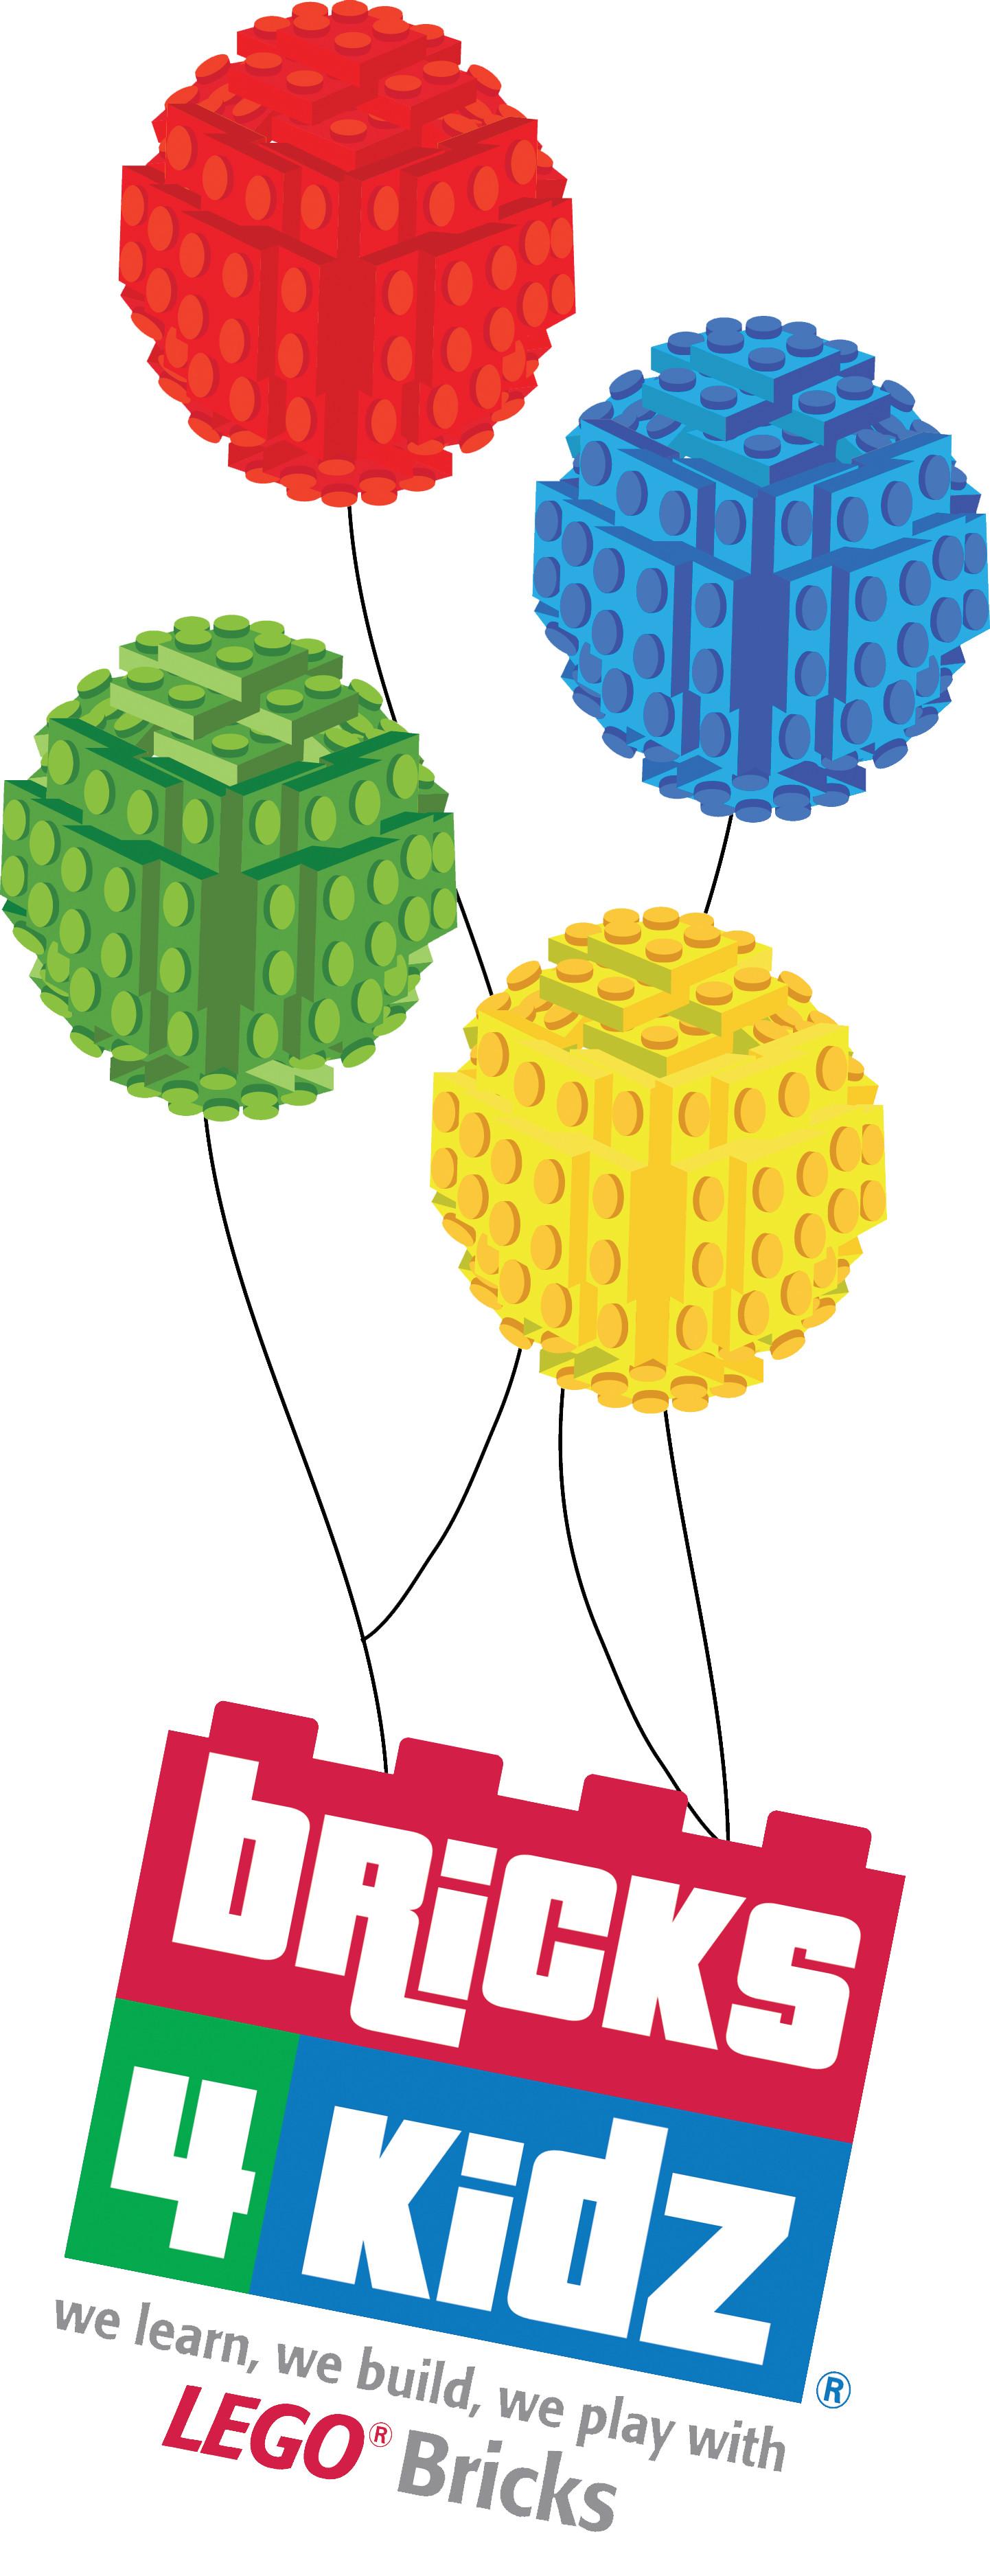 B4k Lego Balloons Jpg on Parent Care